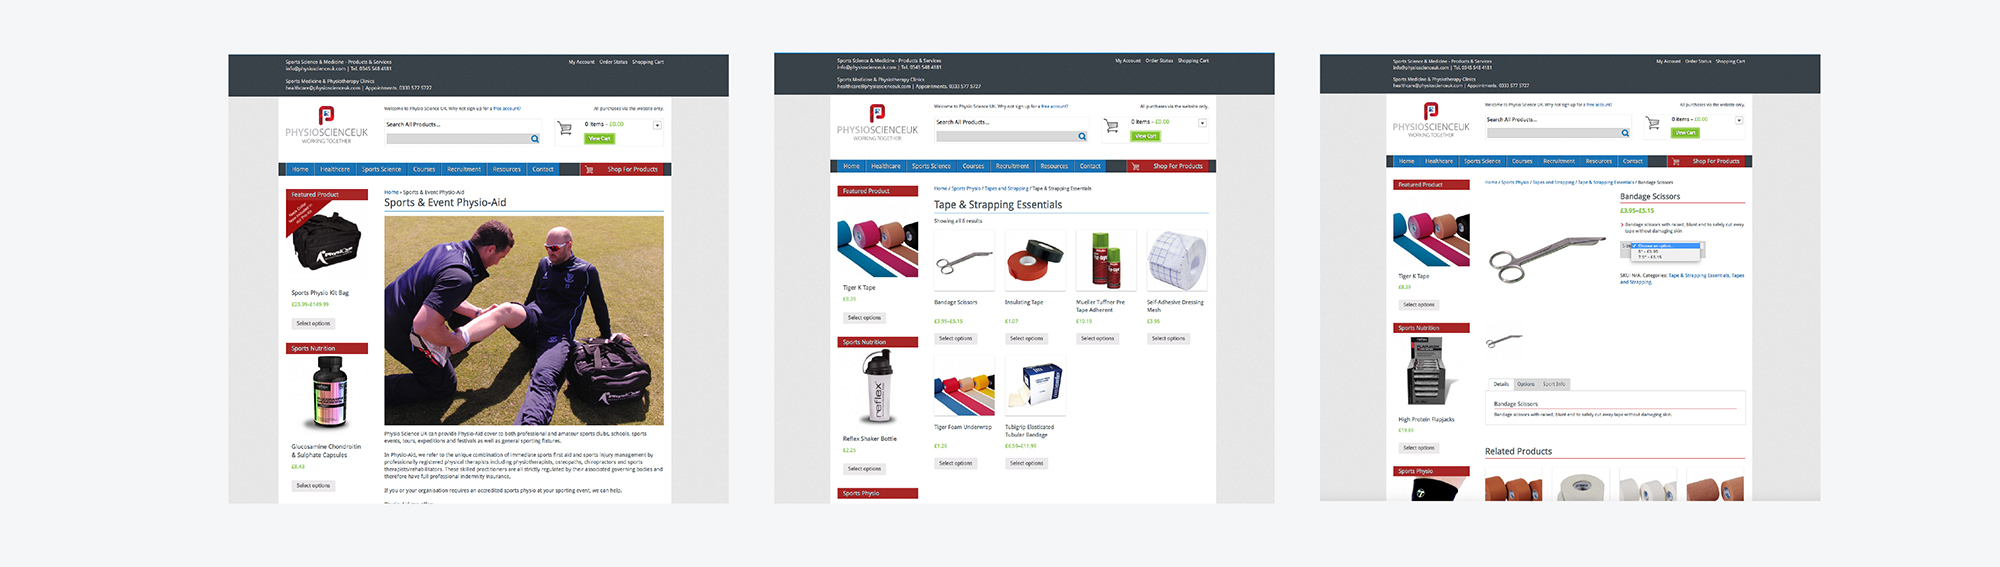 PhysioscienceUK Website